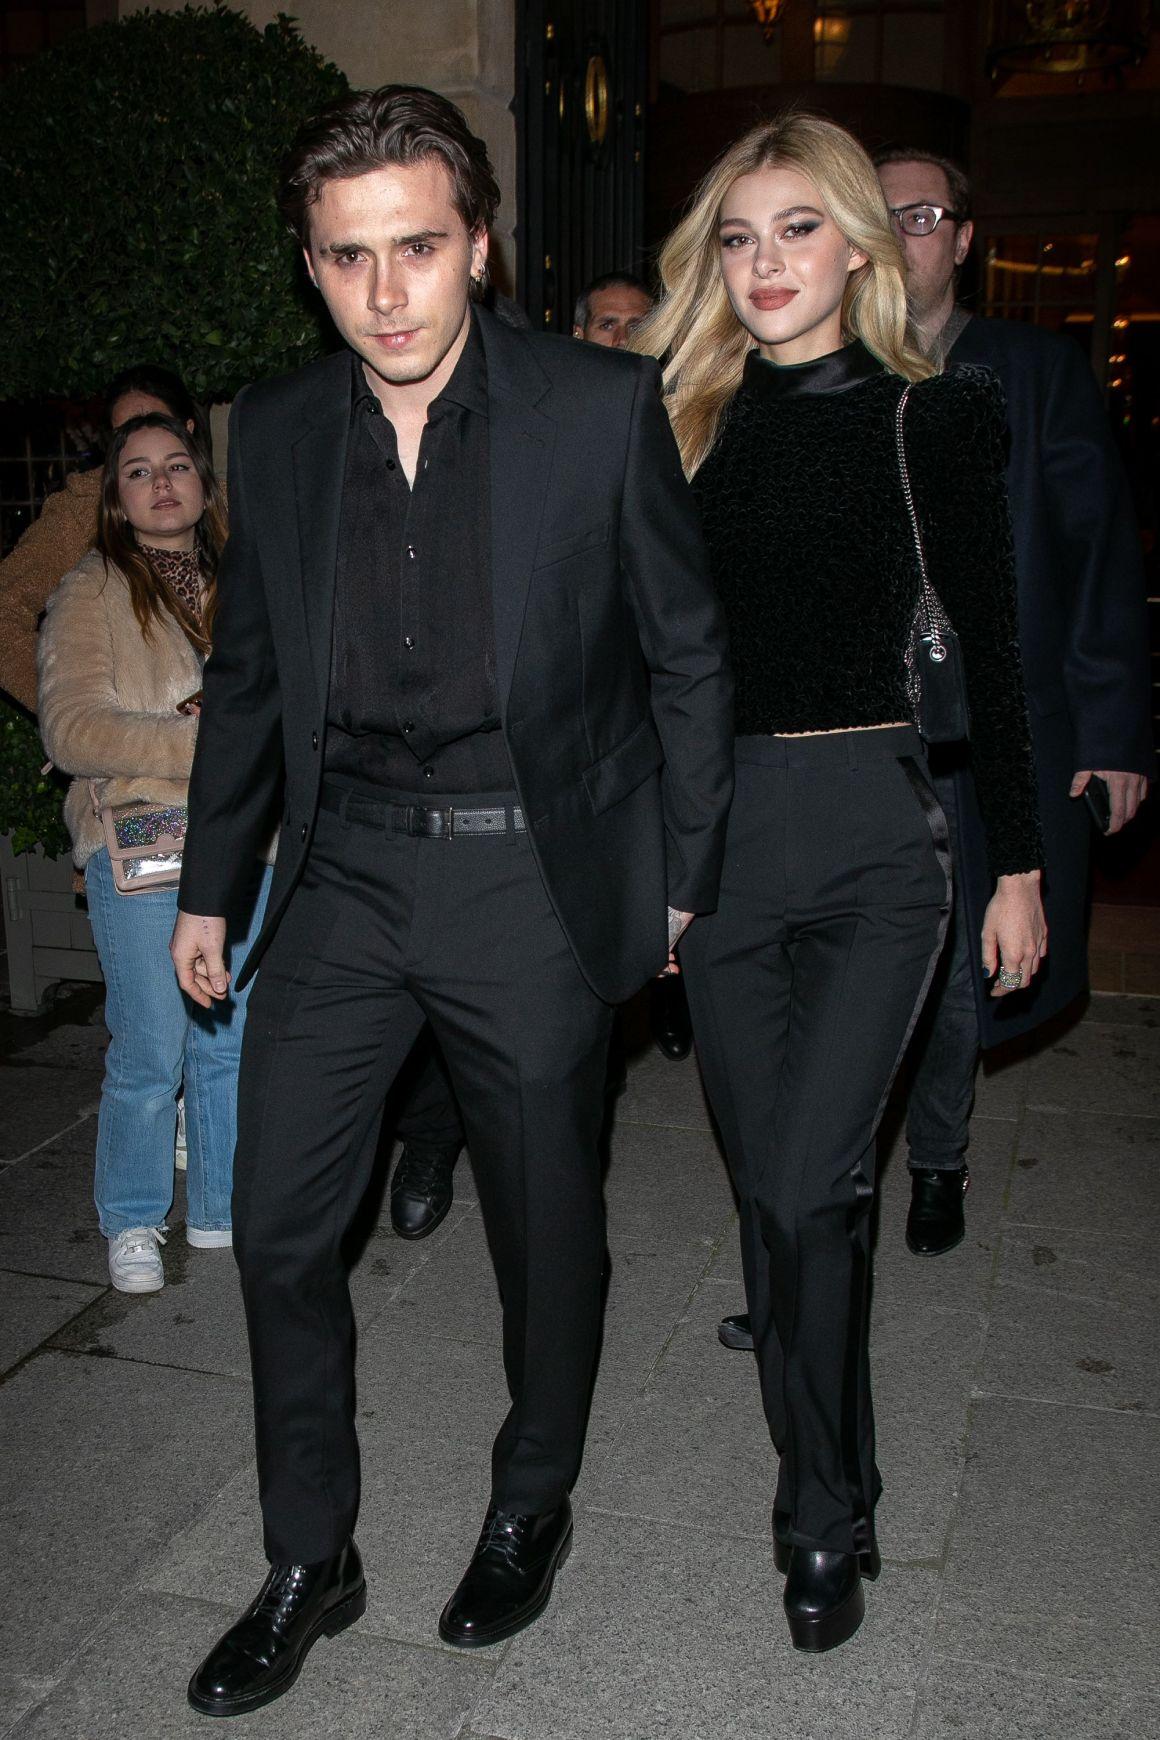 Is Brooklyn Beckham Wearing a Wedding Ring? Brooklyn Beckham Married